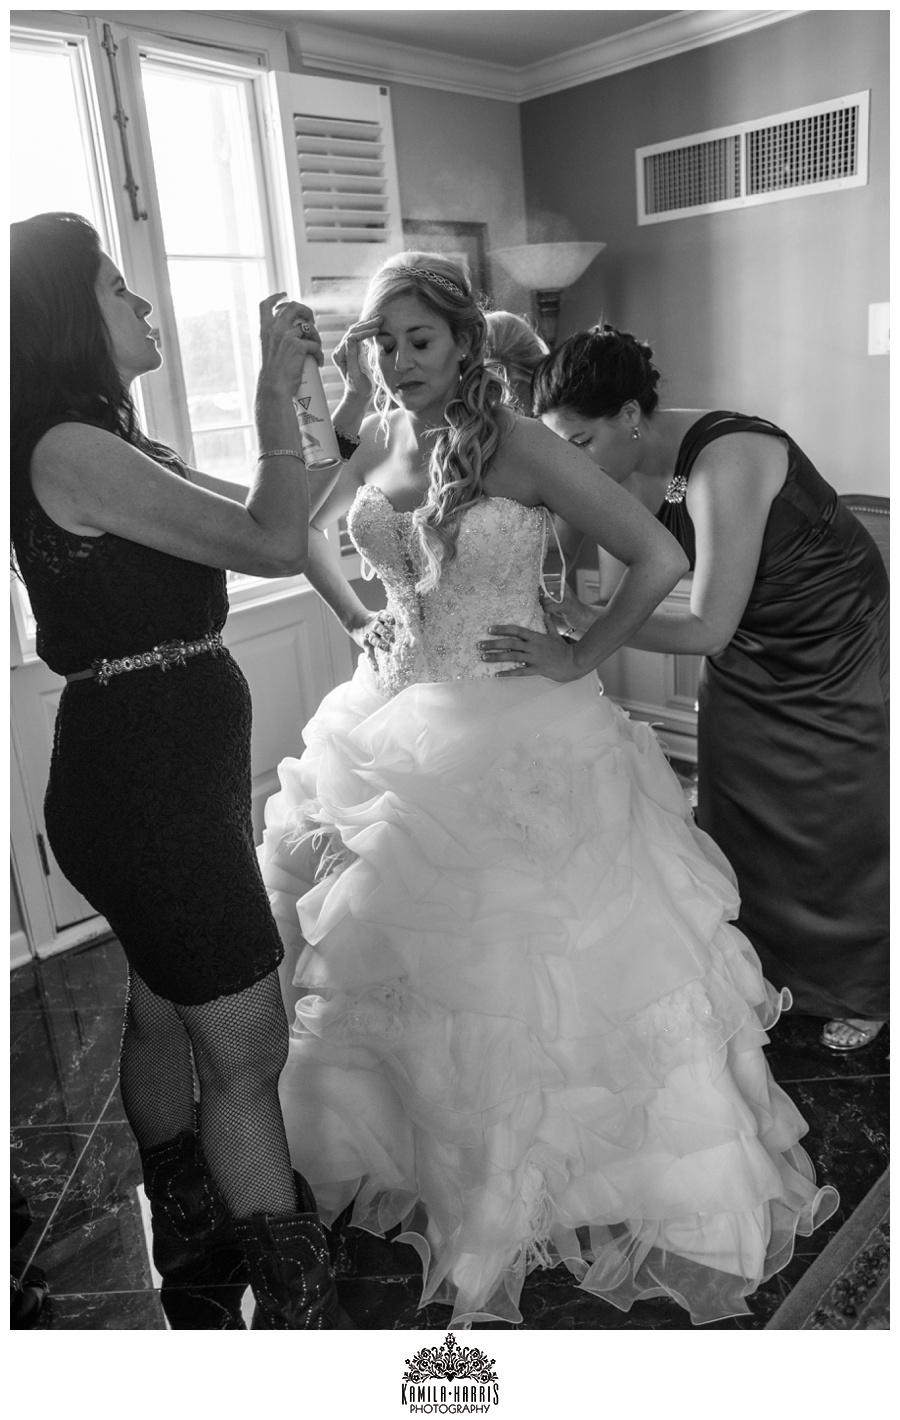 New Orleans Wedding, NOLA Wedding Photographer, New Orleans Wedding Photographer, Hotel Mazarin Wedding, Second Line, Purple, Gold, Feathers, Salon D Nola, Kinfolk Brass Band